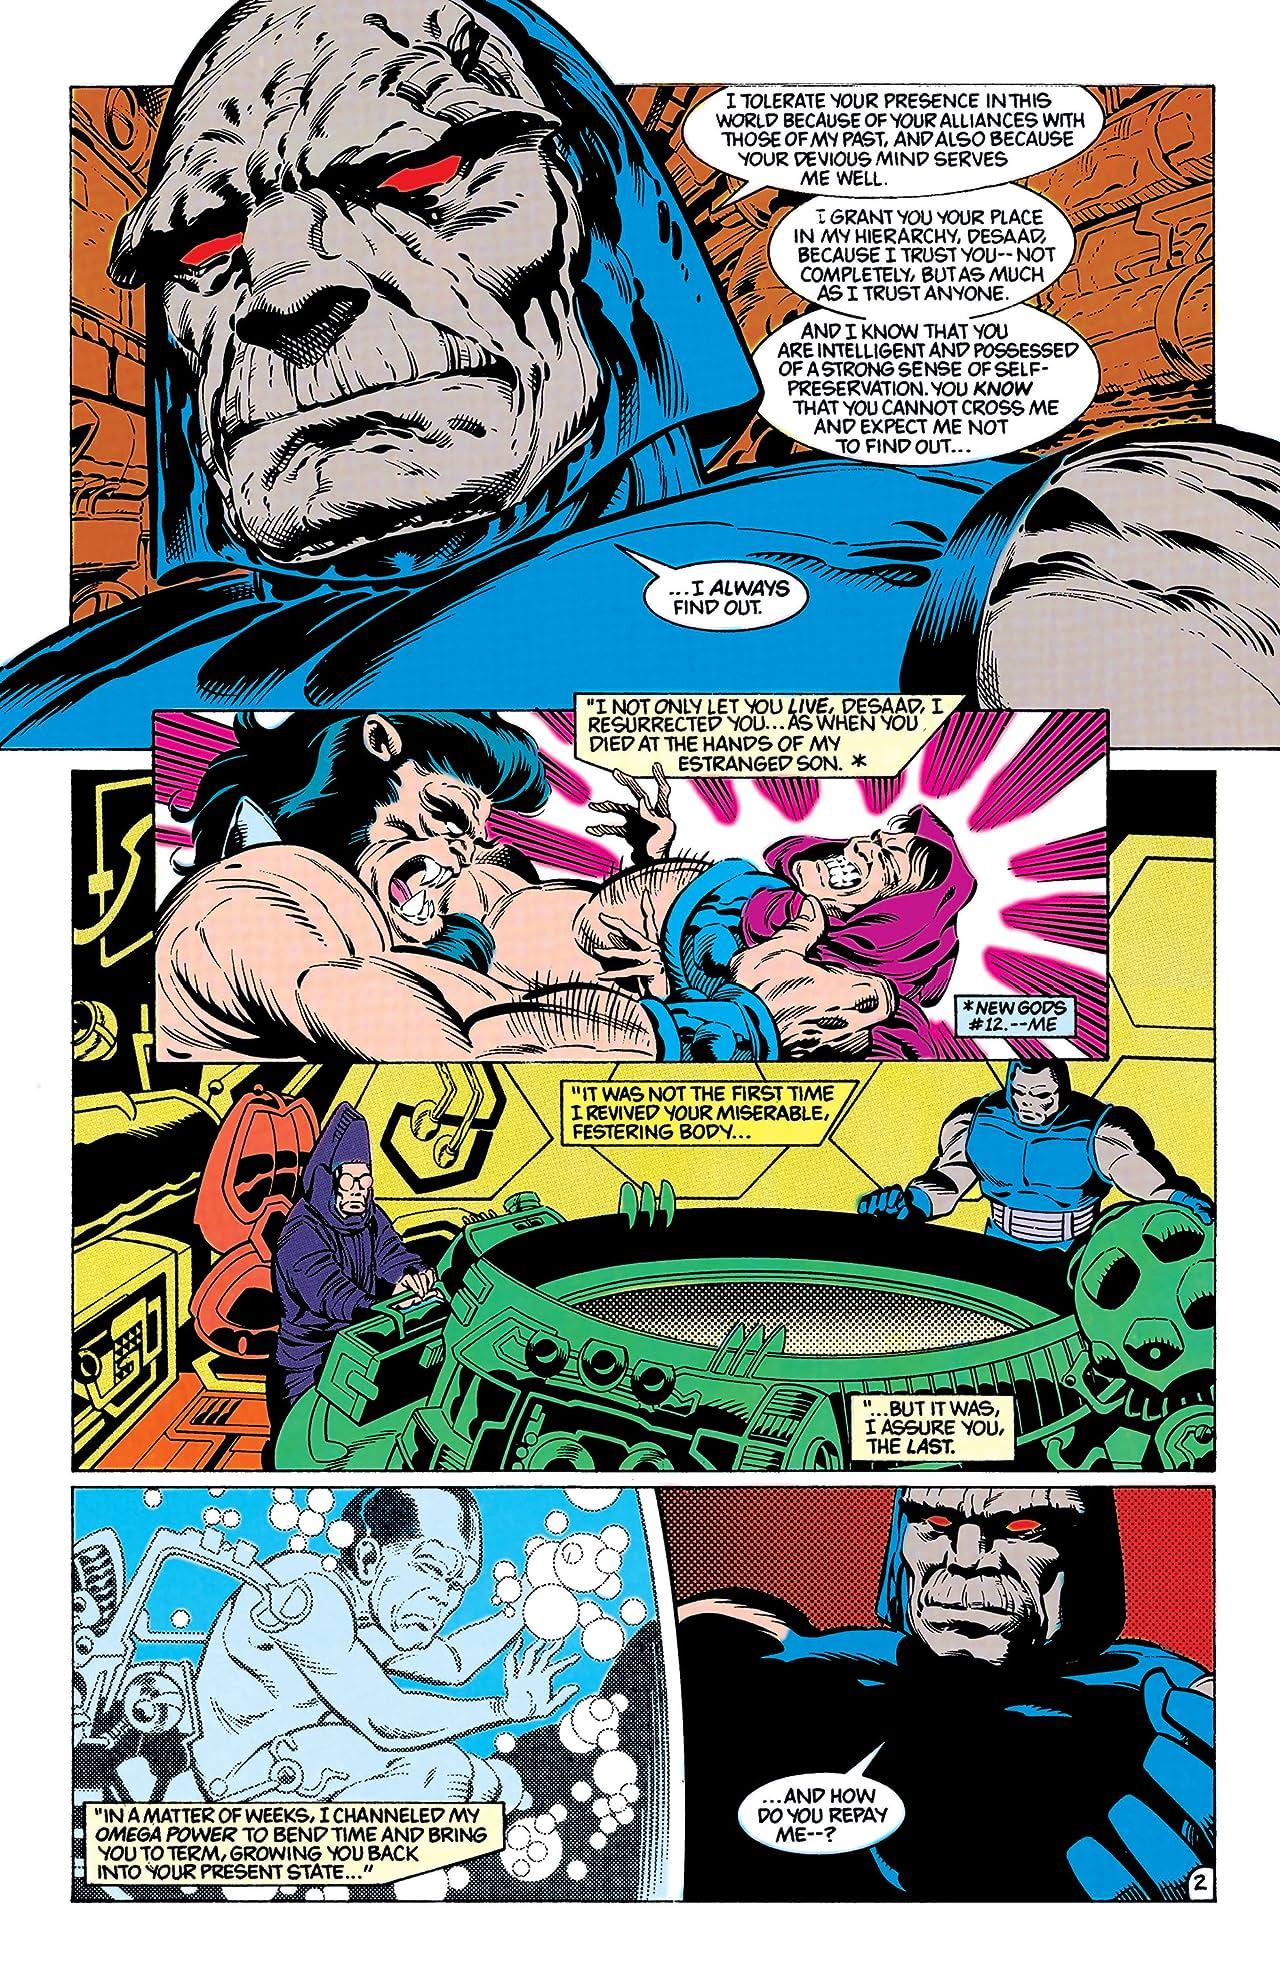 New Gods (1989-1991) #15